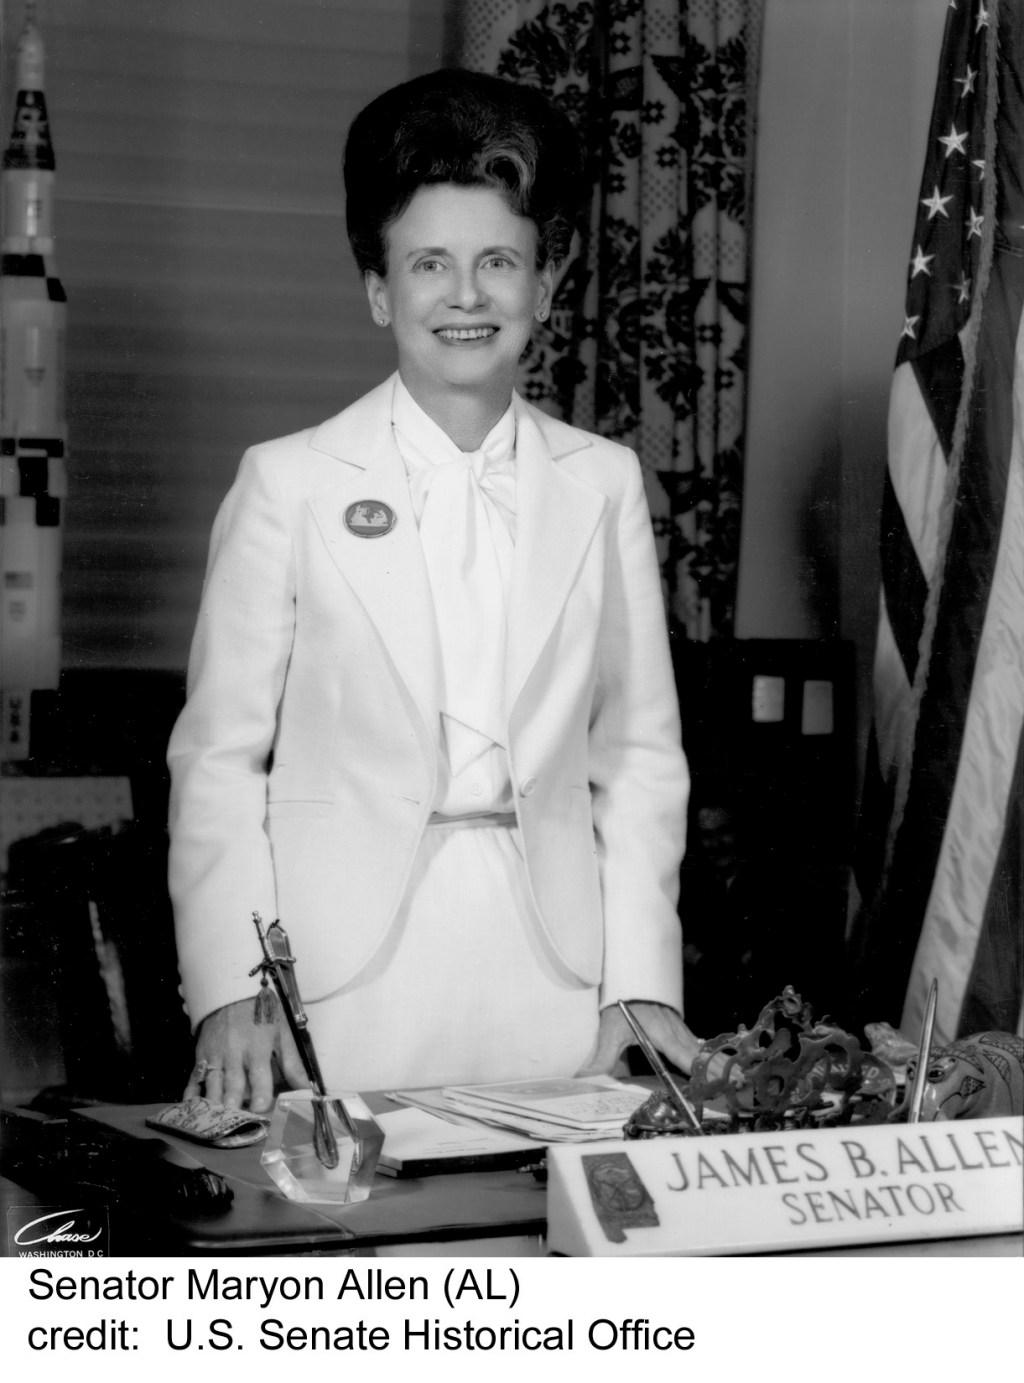 Sen. Maryon Allen, D-Ala., who died on July 23. (Courtesy U.S. Senate Historical Office)